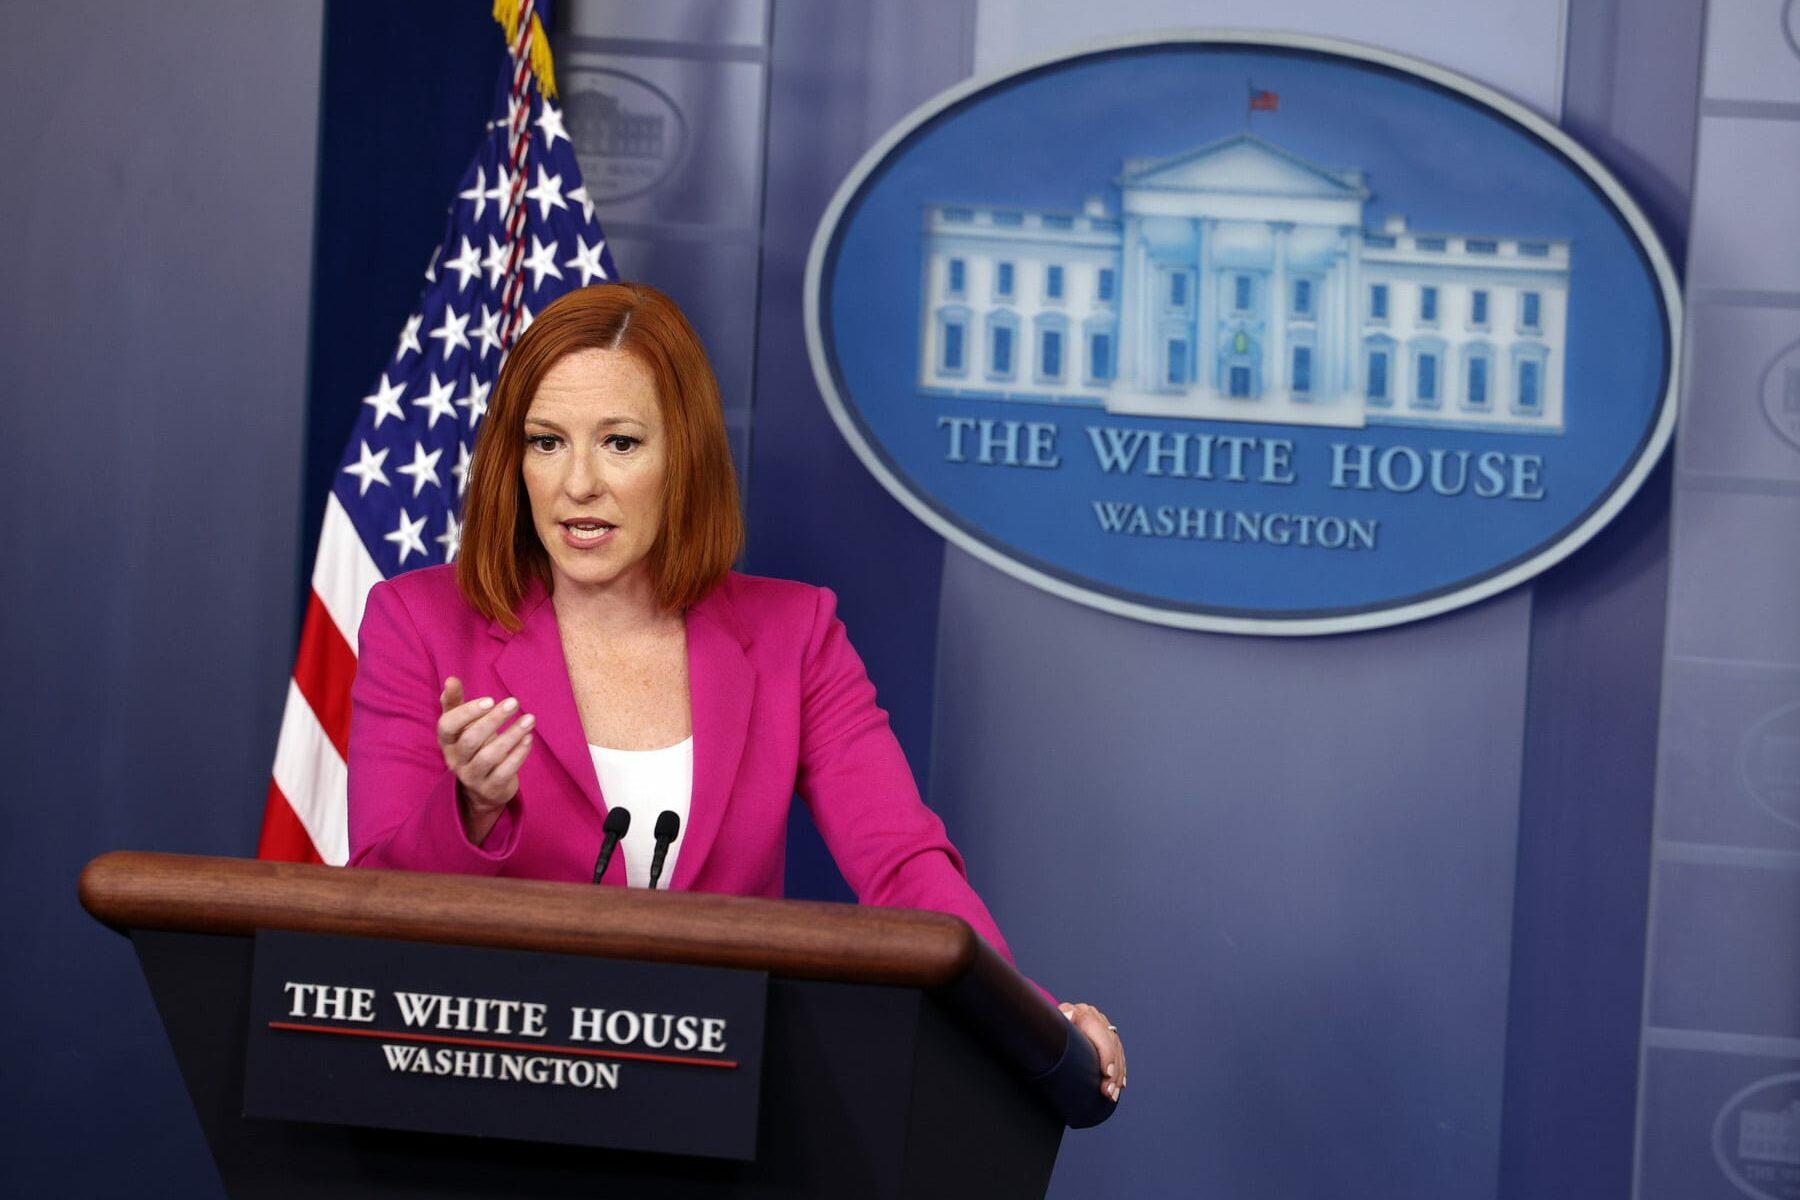 White House Press Secretary Jen Psaki stands at a podium.